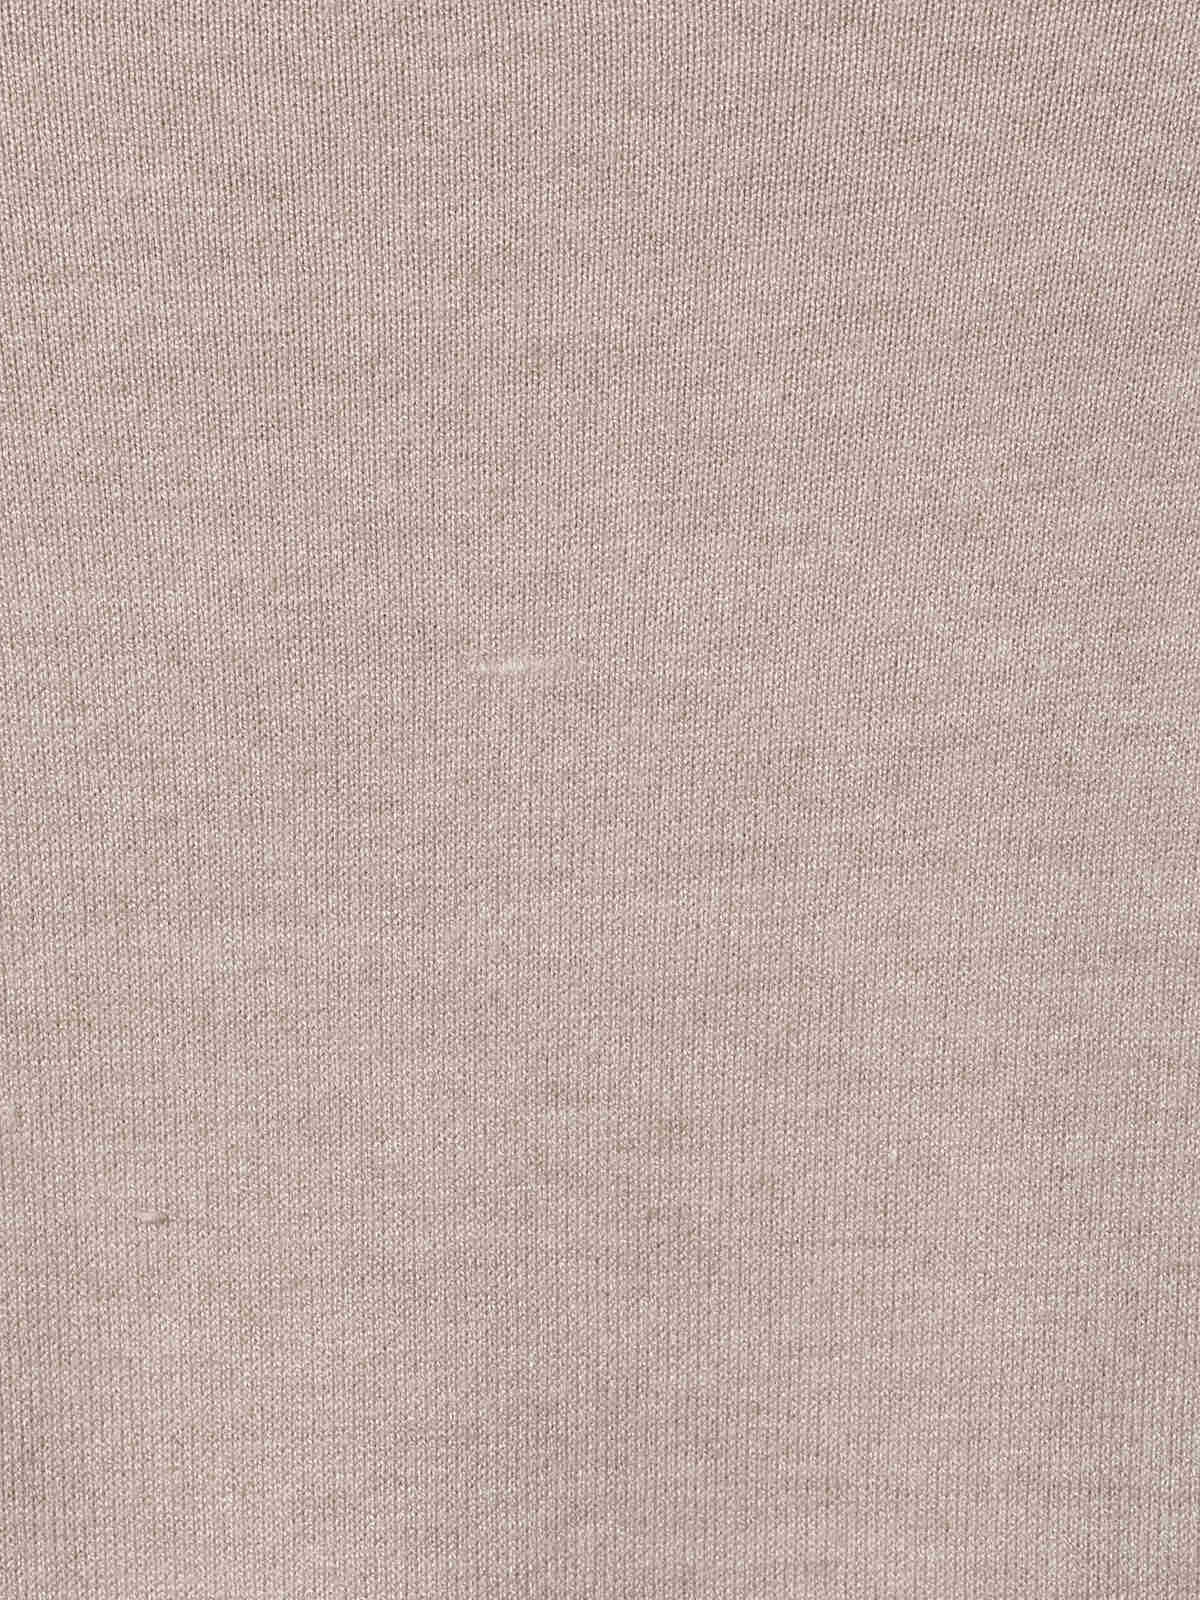 Camiseta mujer punto costuras Beige